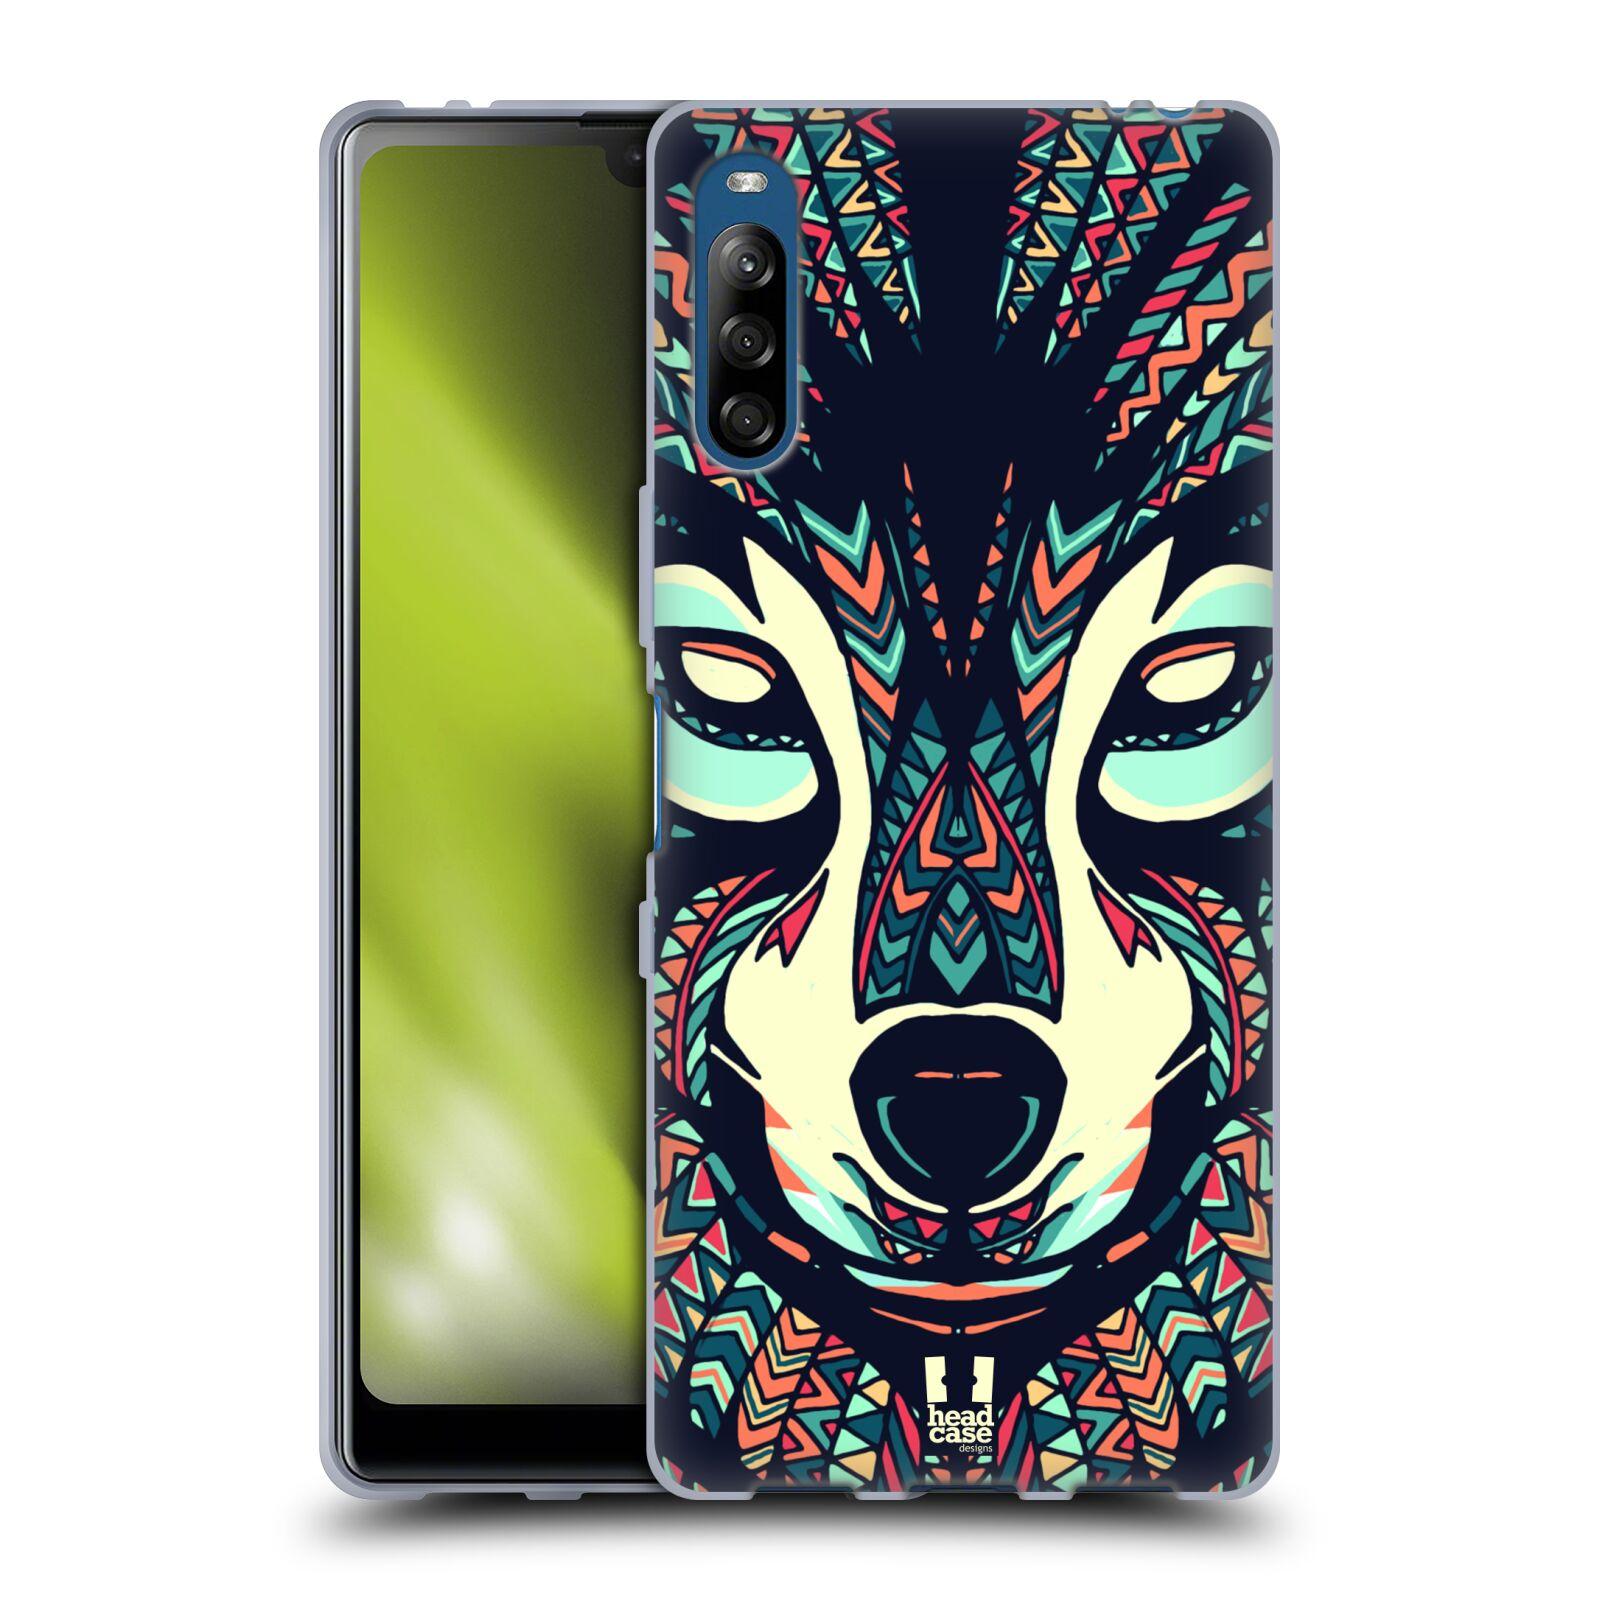 Silikonové pouzdro na mobil Sony Xperia L4 - Head Case - AZTEC VLK